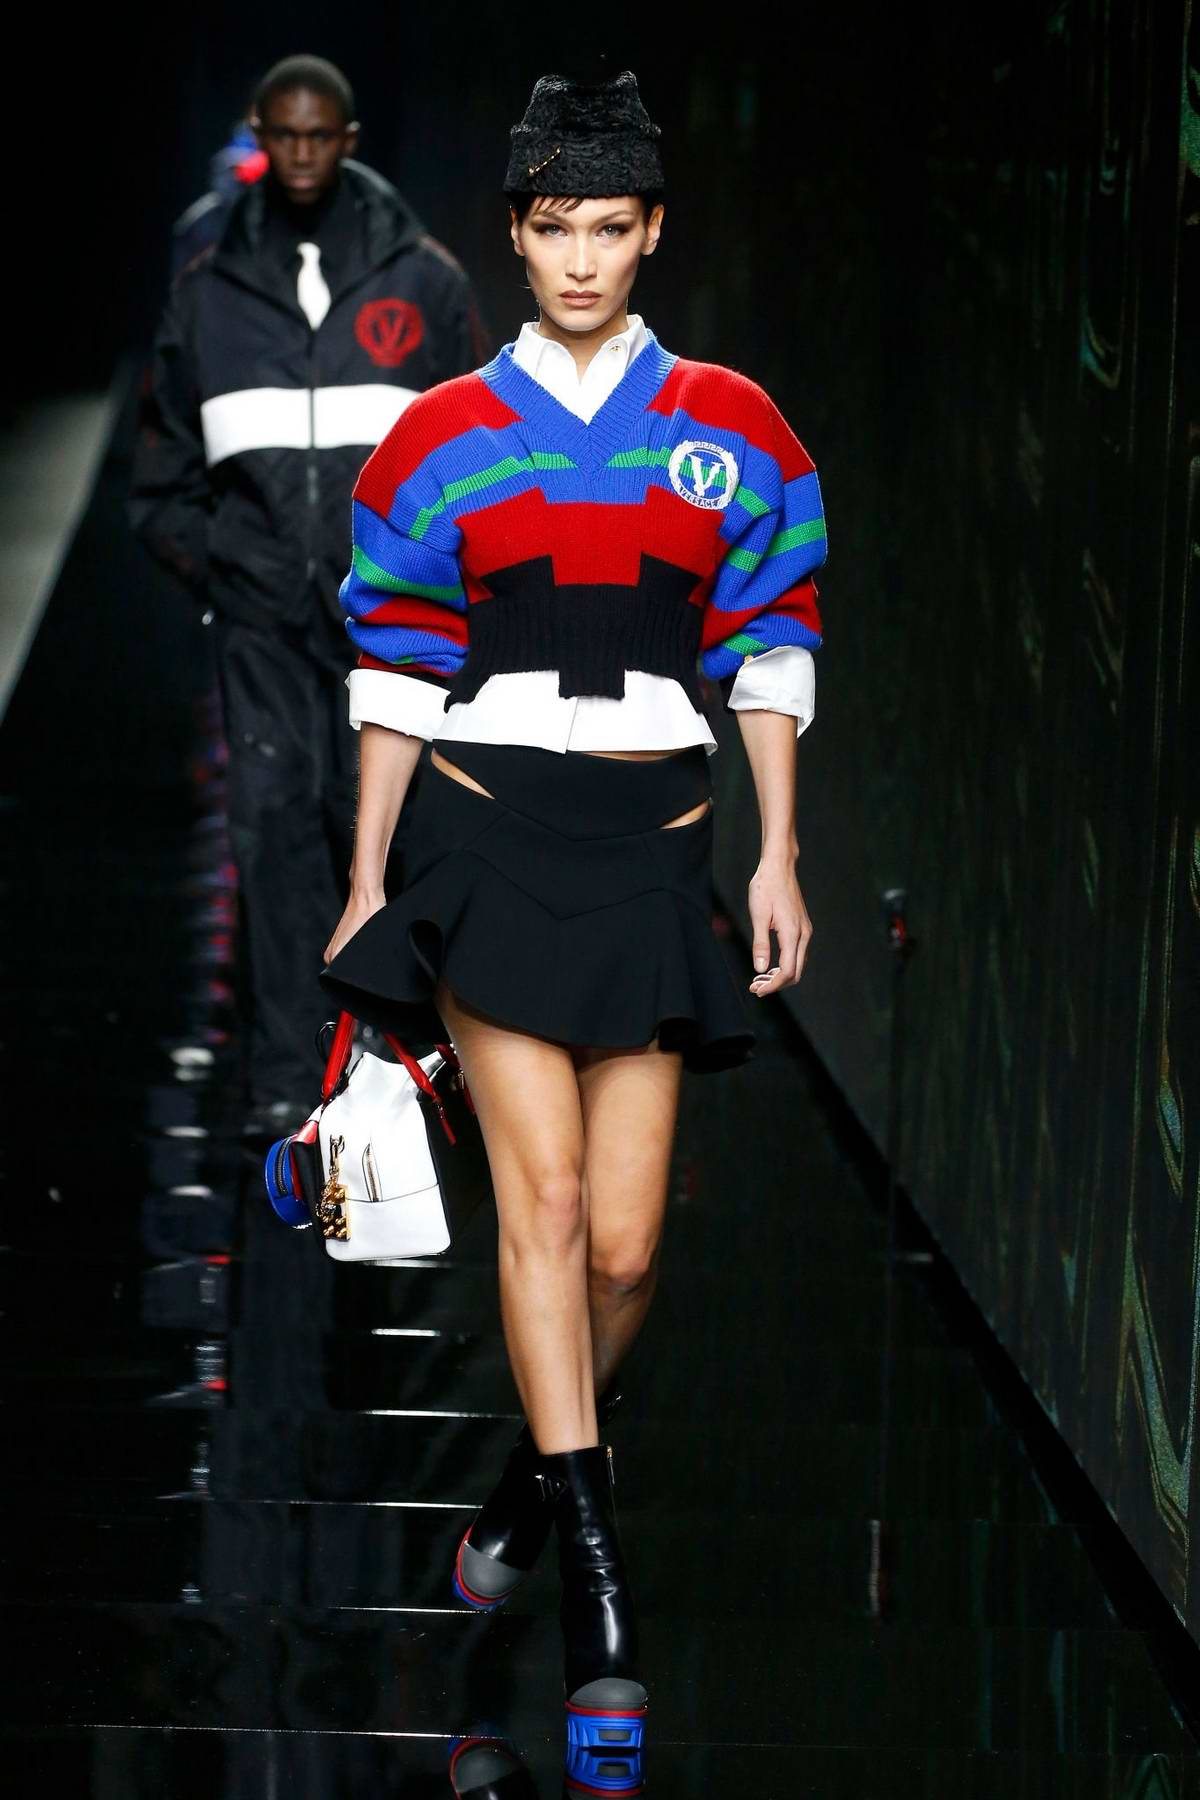 Bella Hadid walks the runway at the Versace fashion show, F/W 2020 during Milan Fashion Week in Milan, Italy